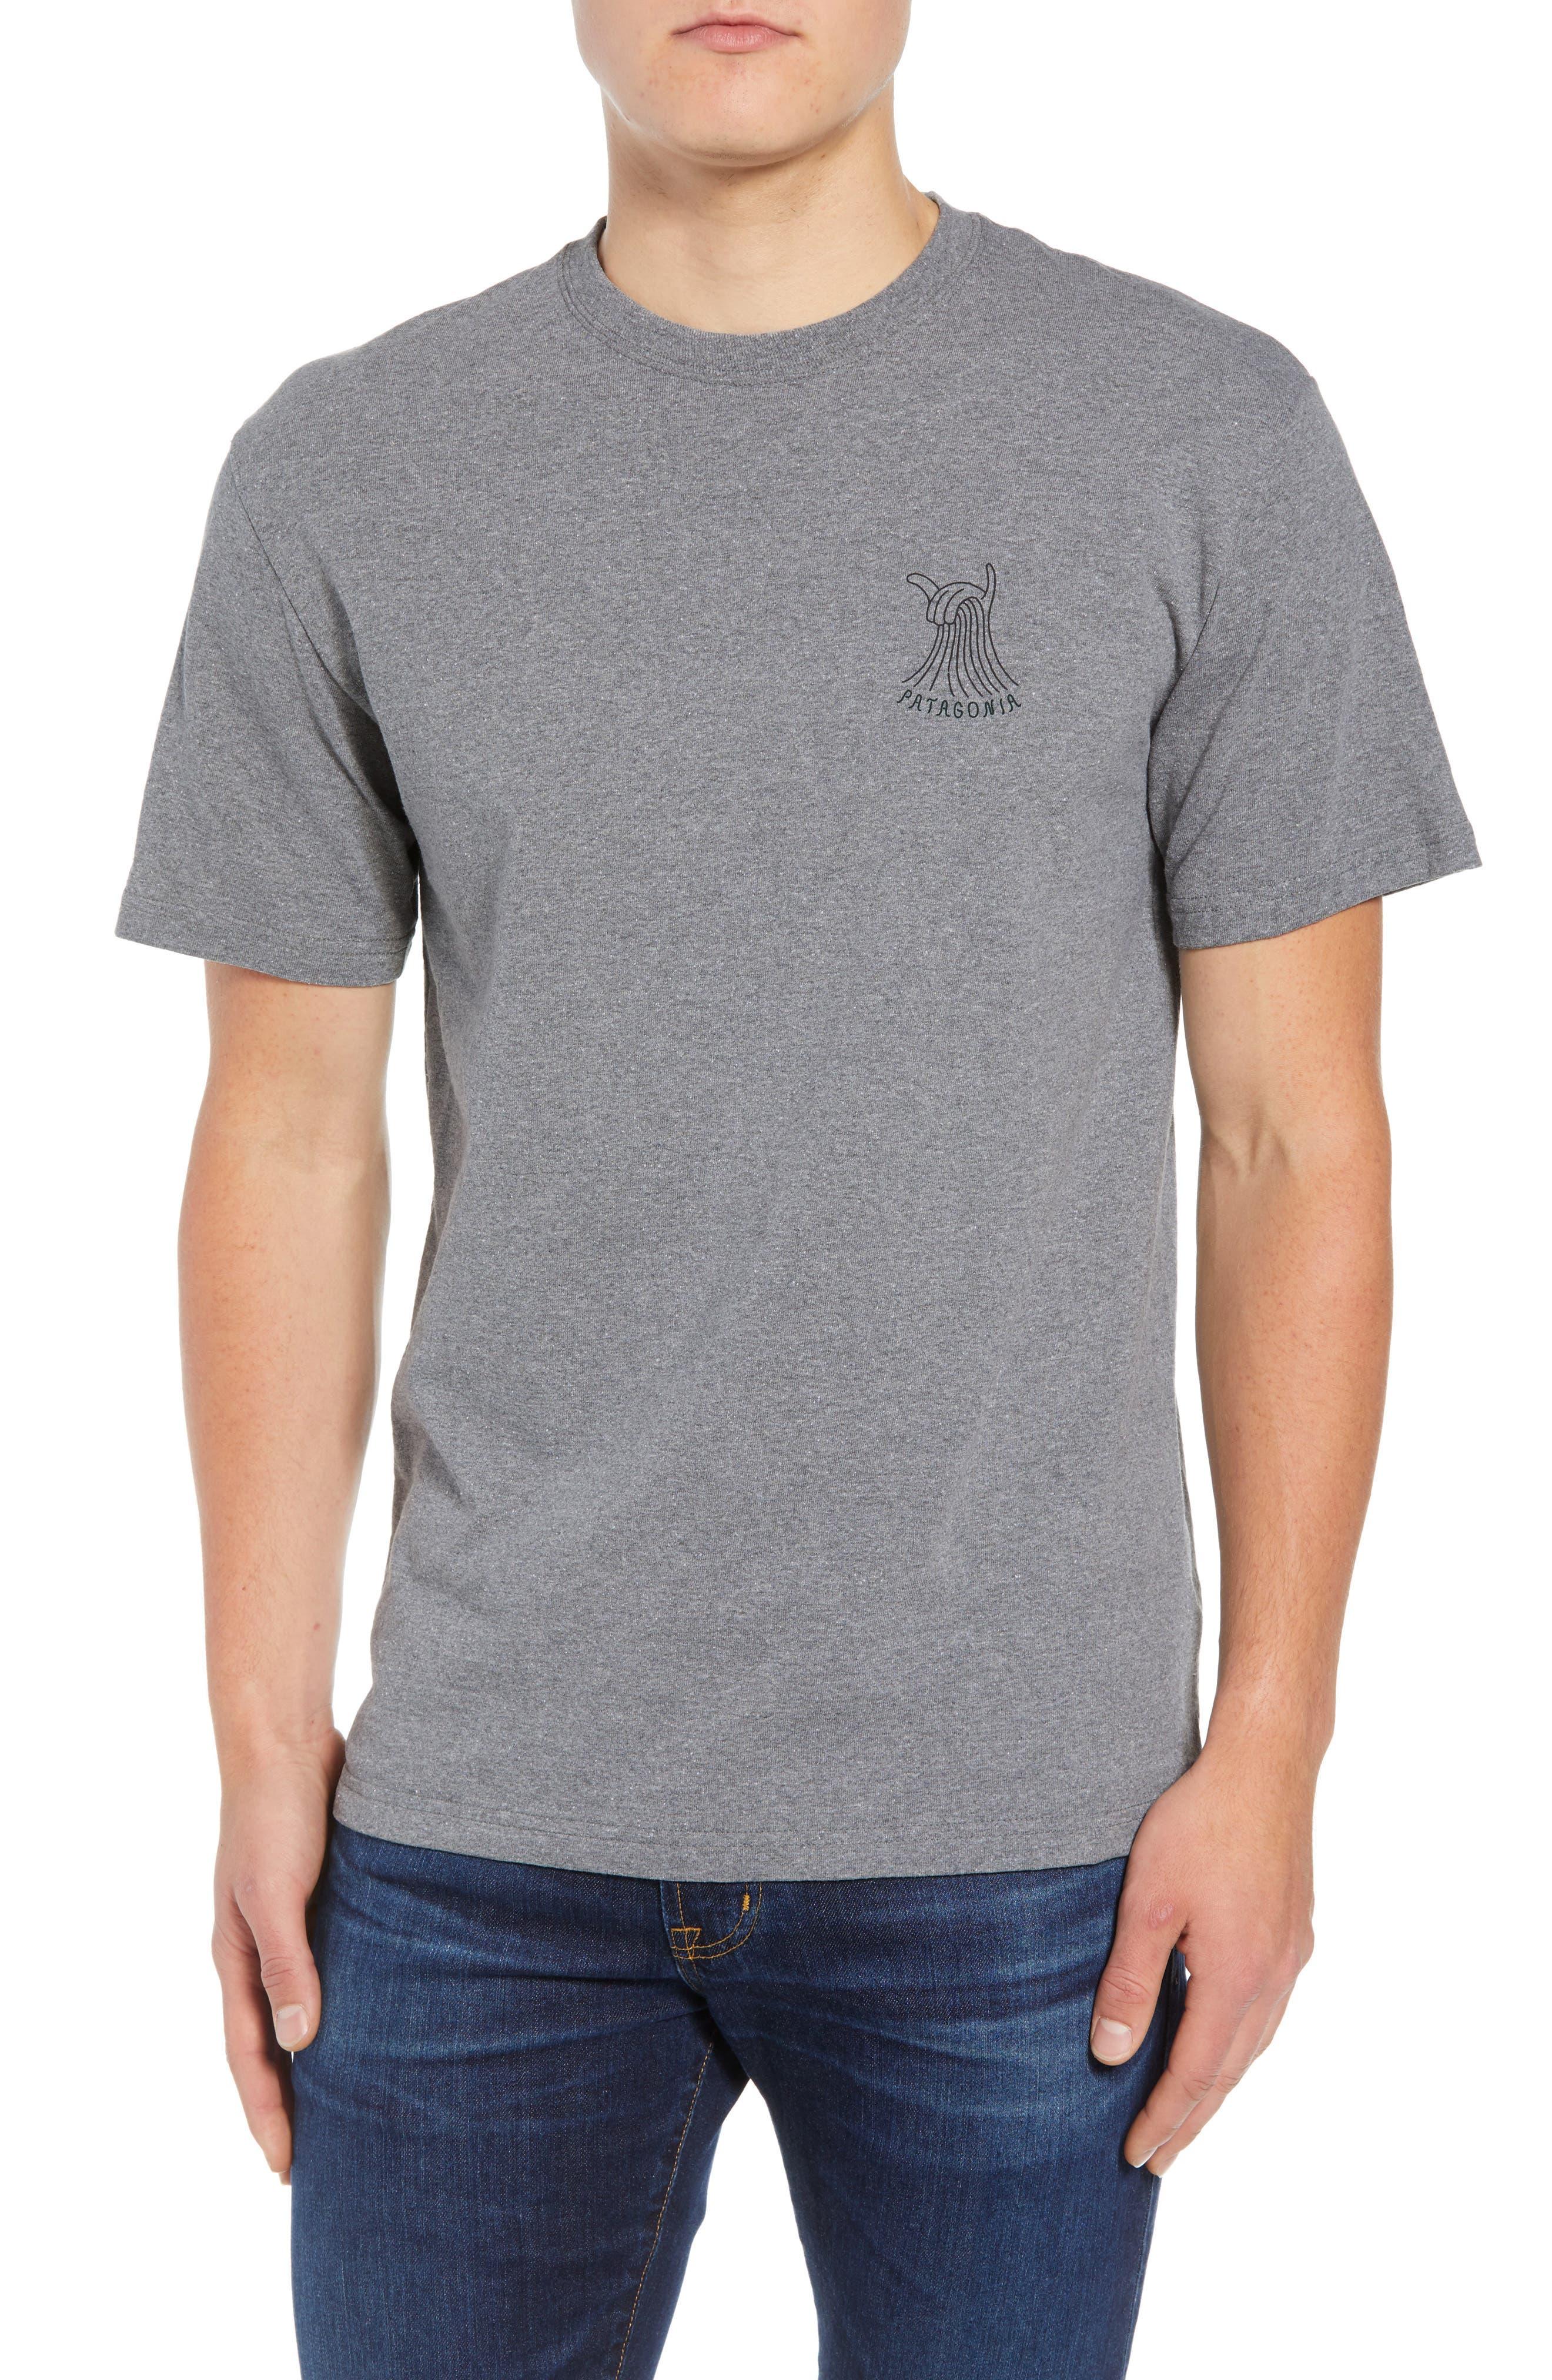 Shaka Wave Slim Fit T-Shirt,                             Main thumbnail 1, color,                             GRAVEL HEATHER